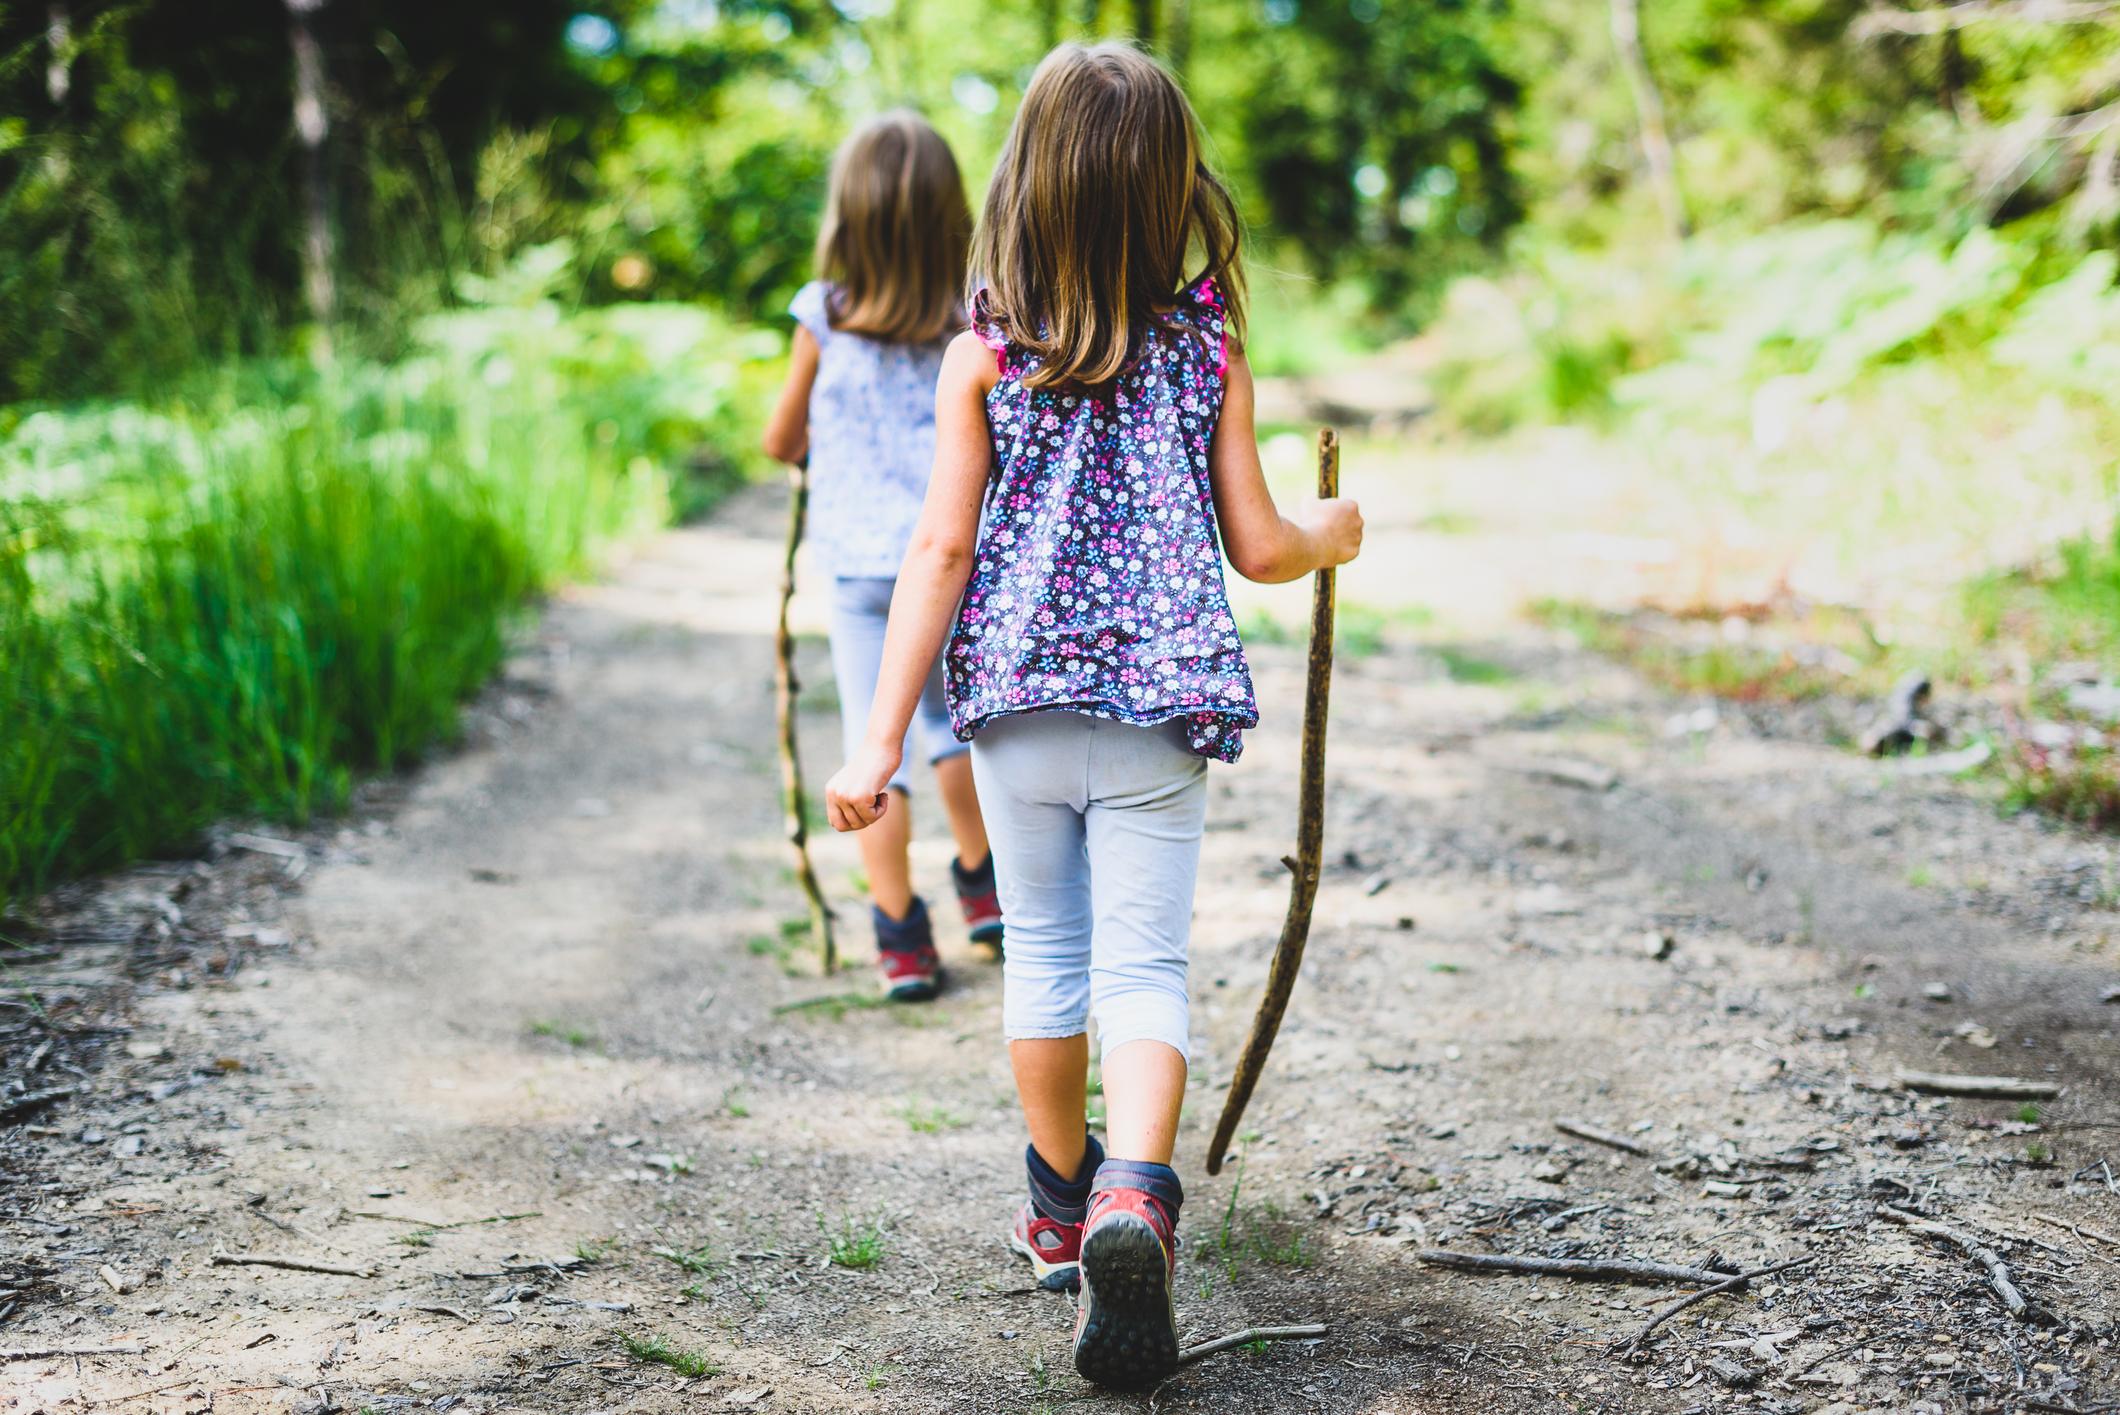 girlshiking.jpg